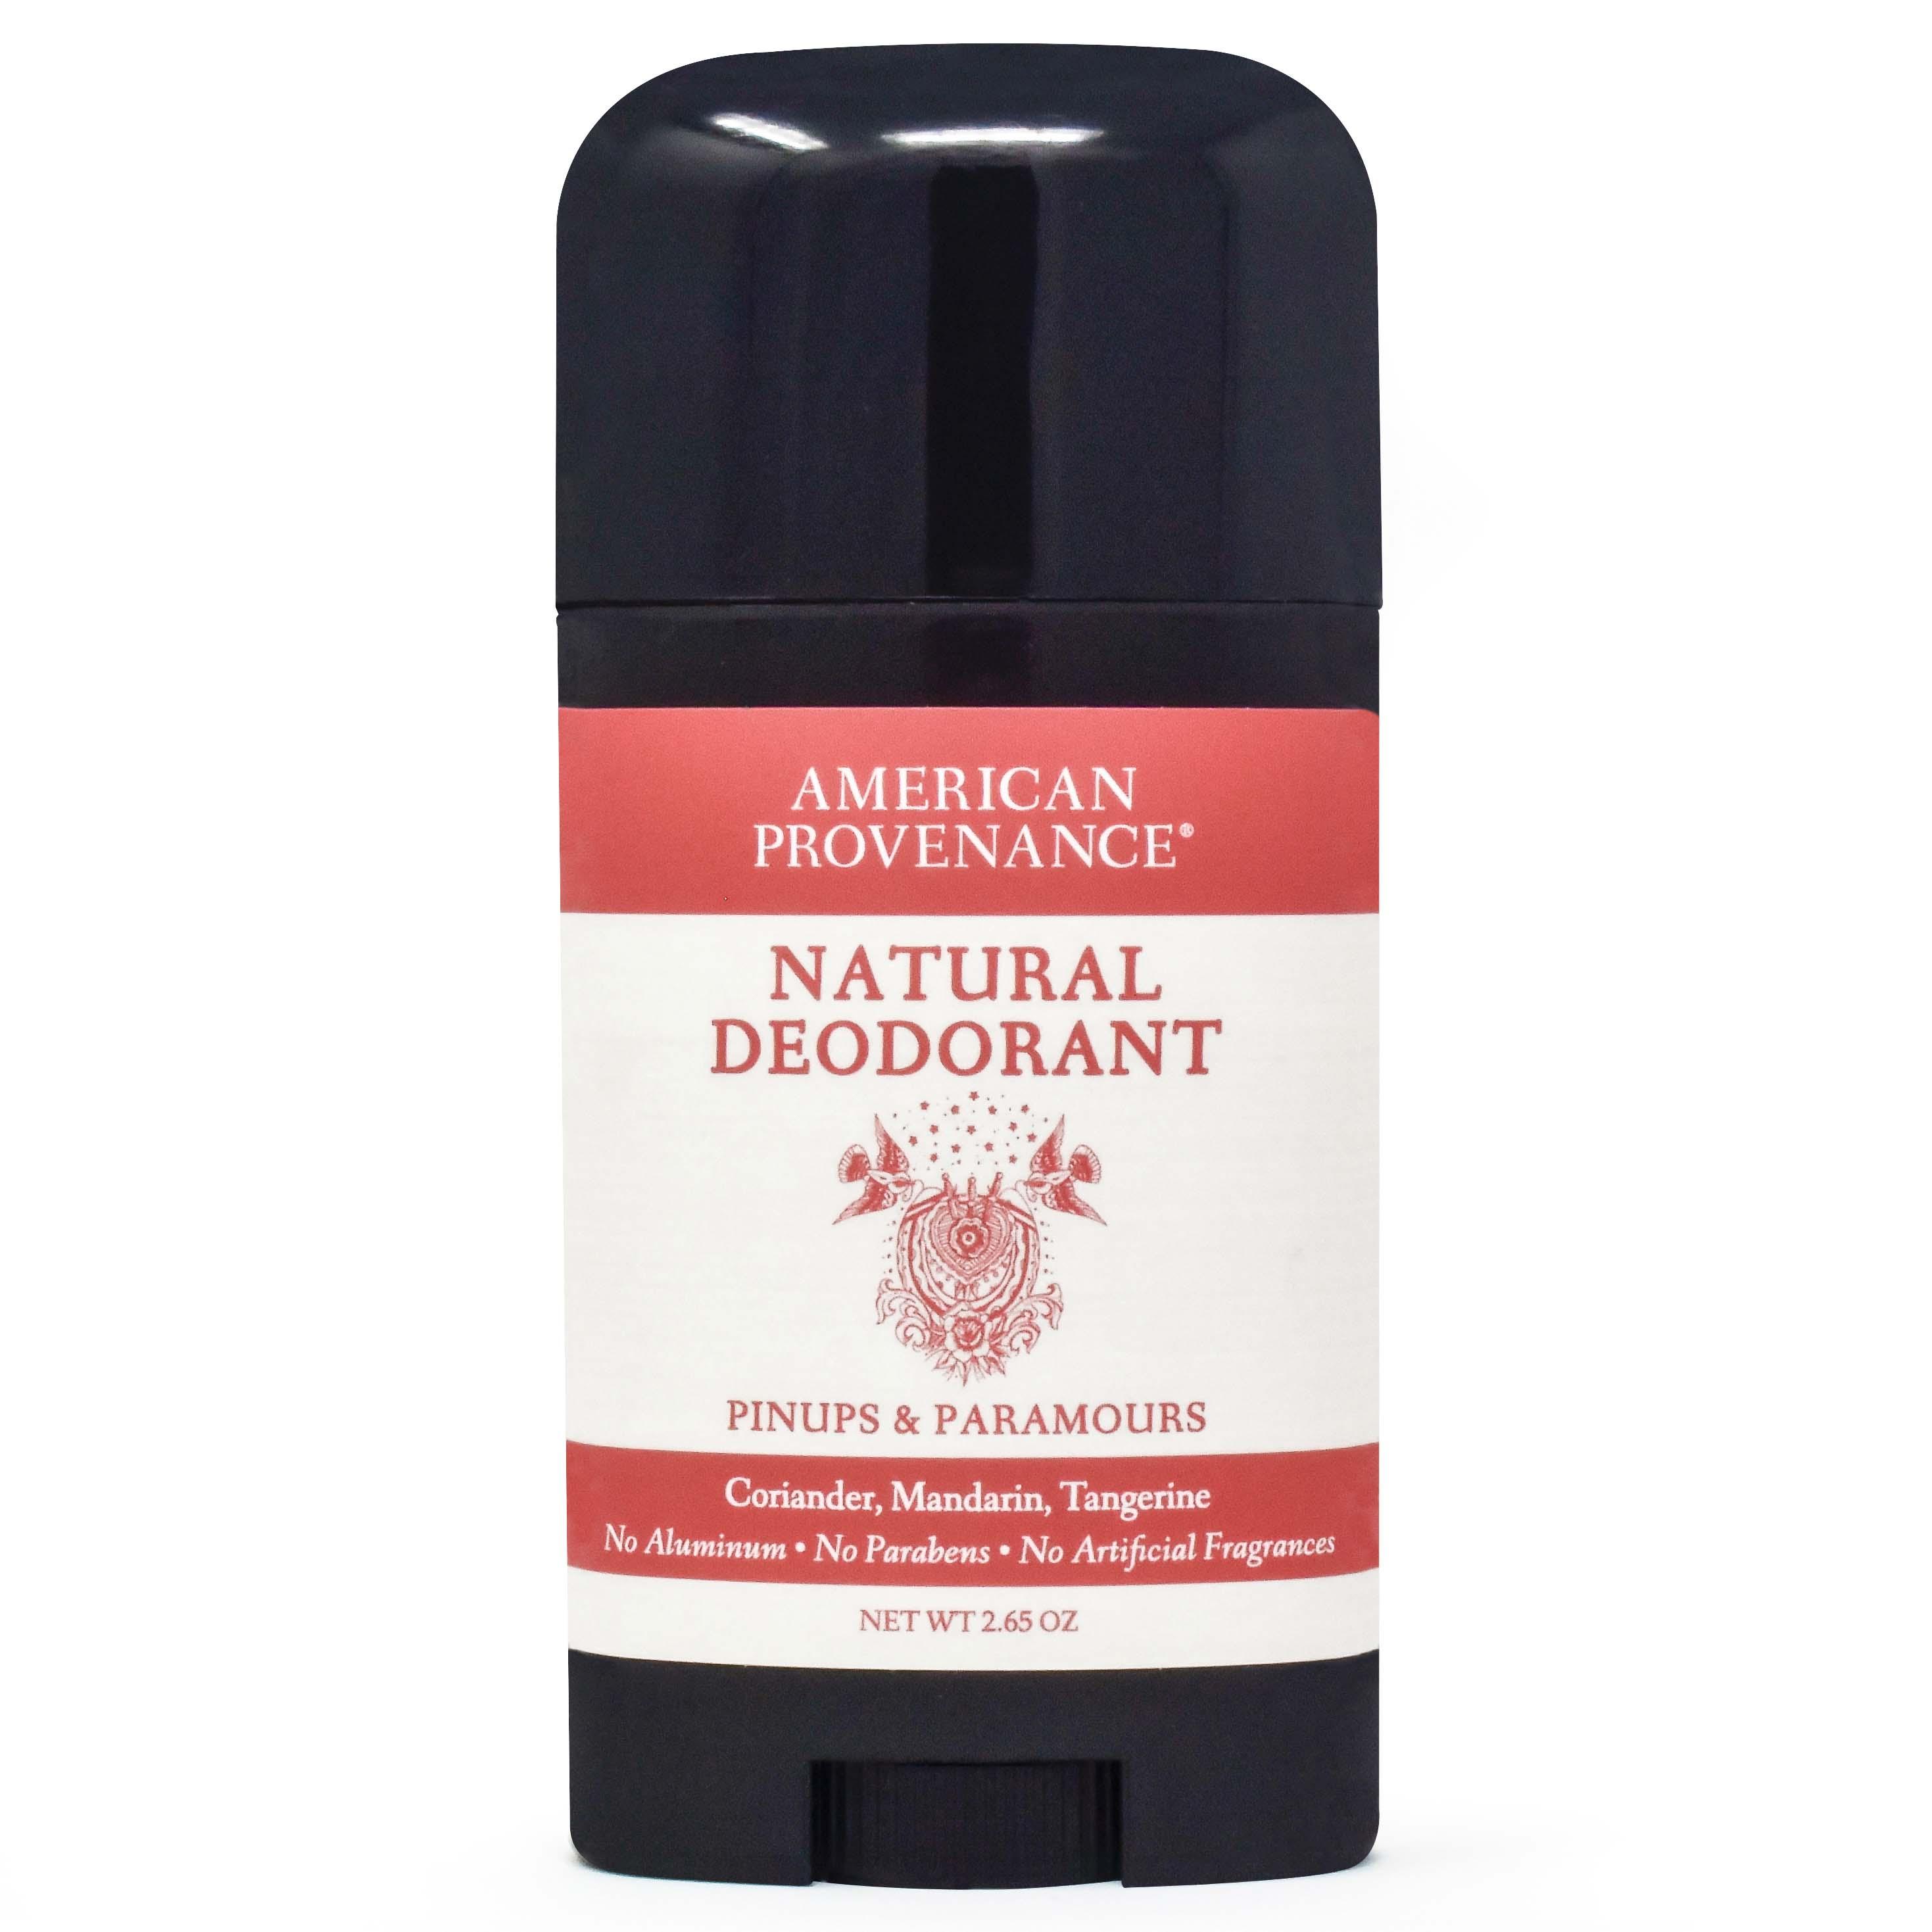 American Provenance Natural Deodorant Pinups + Paramours